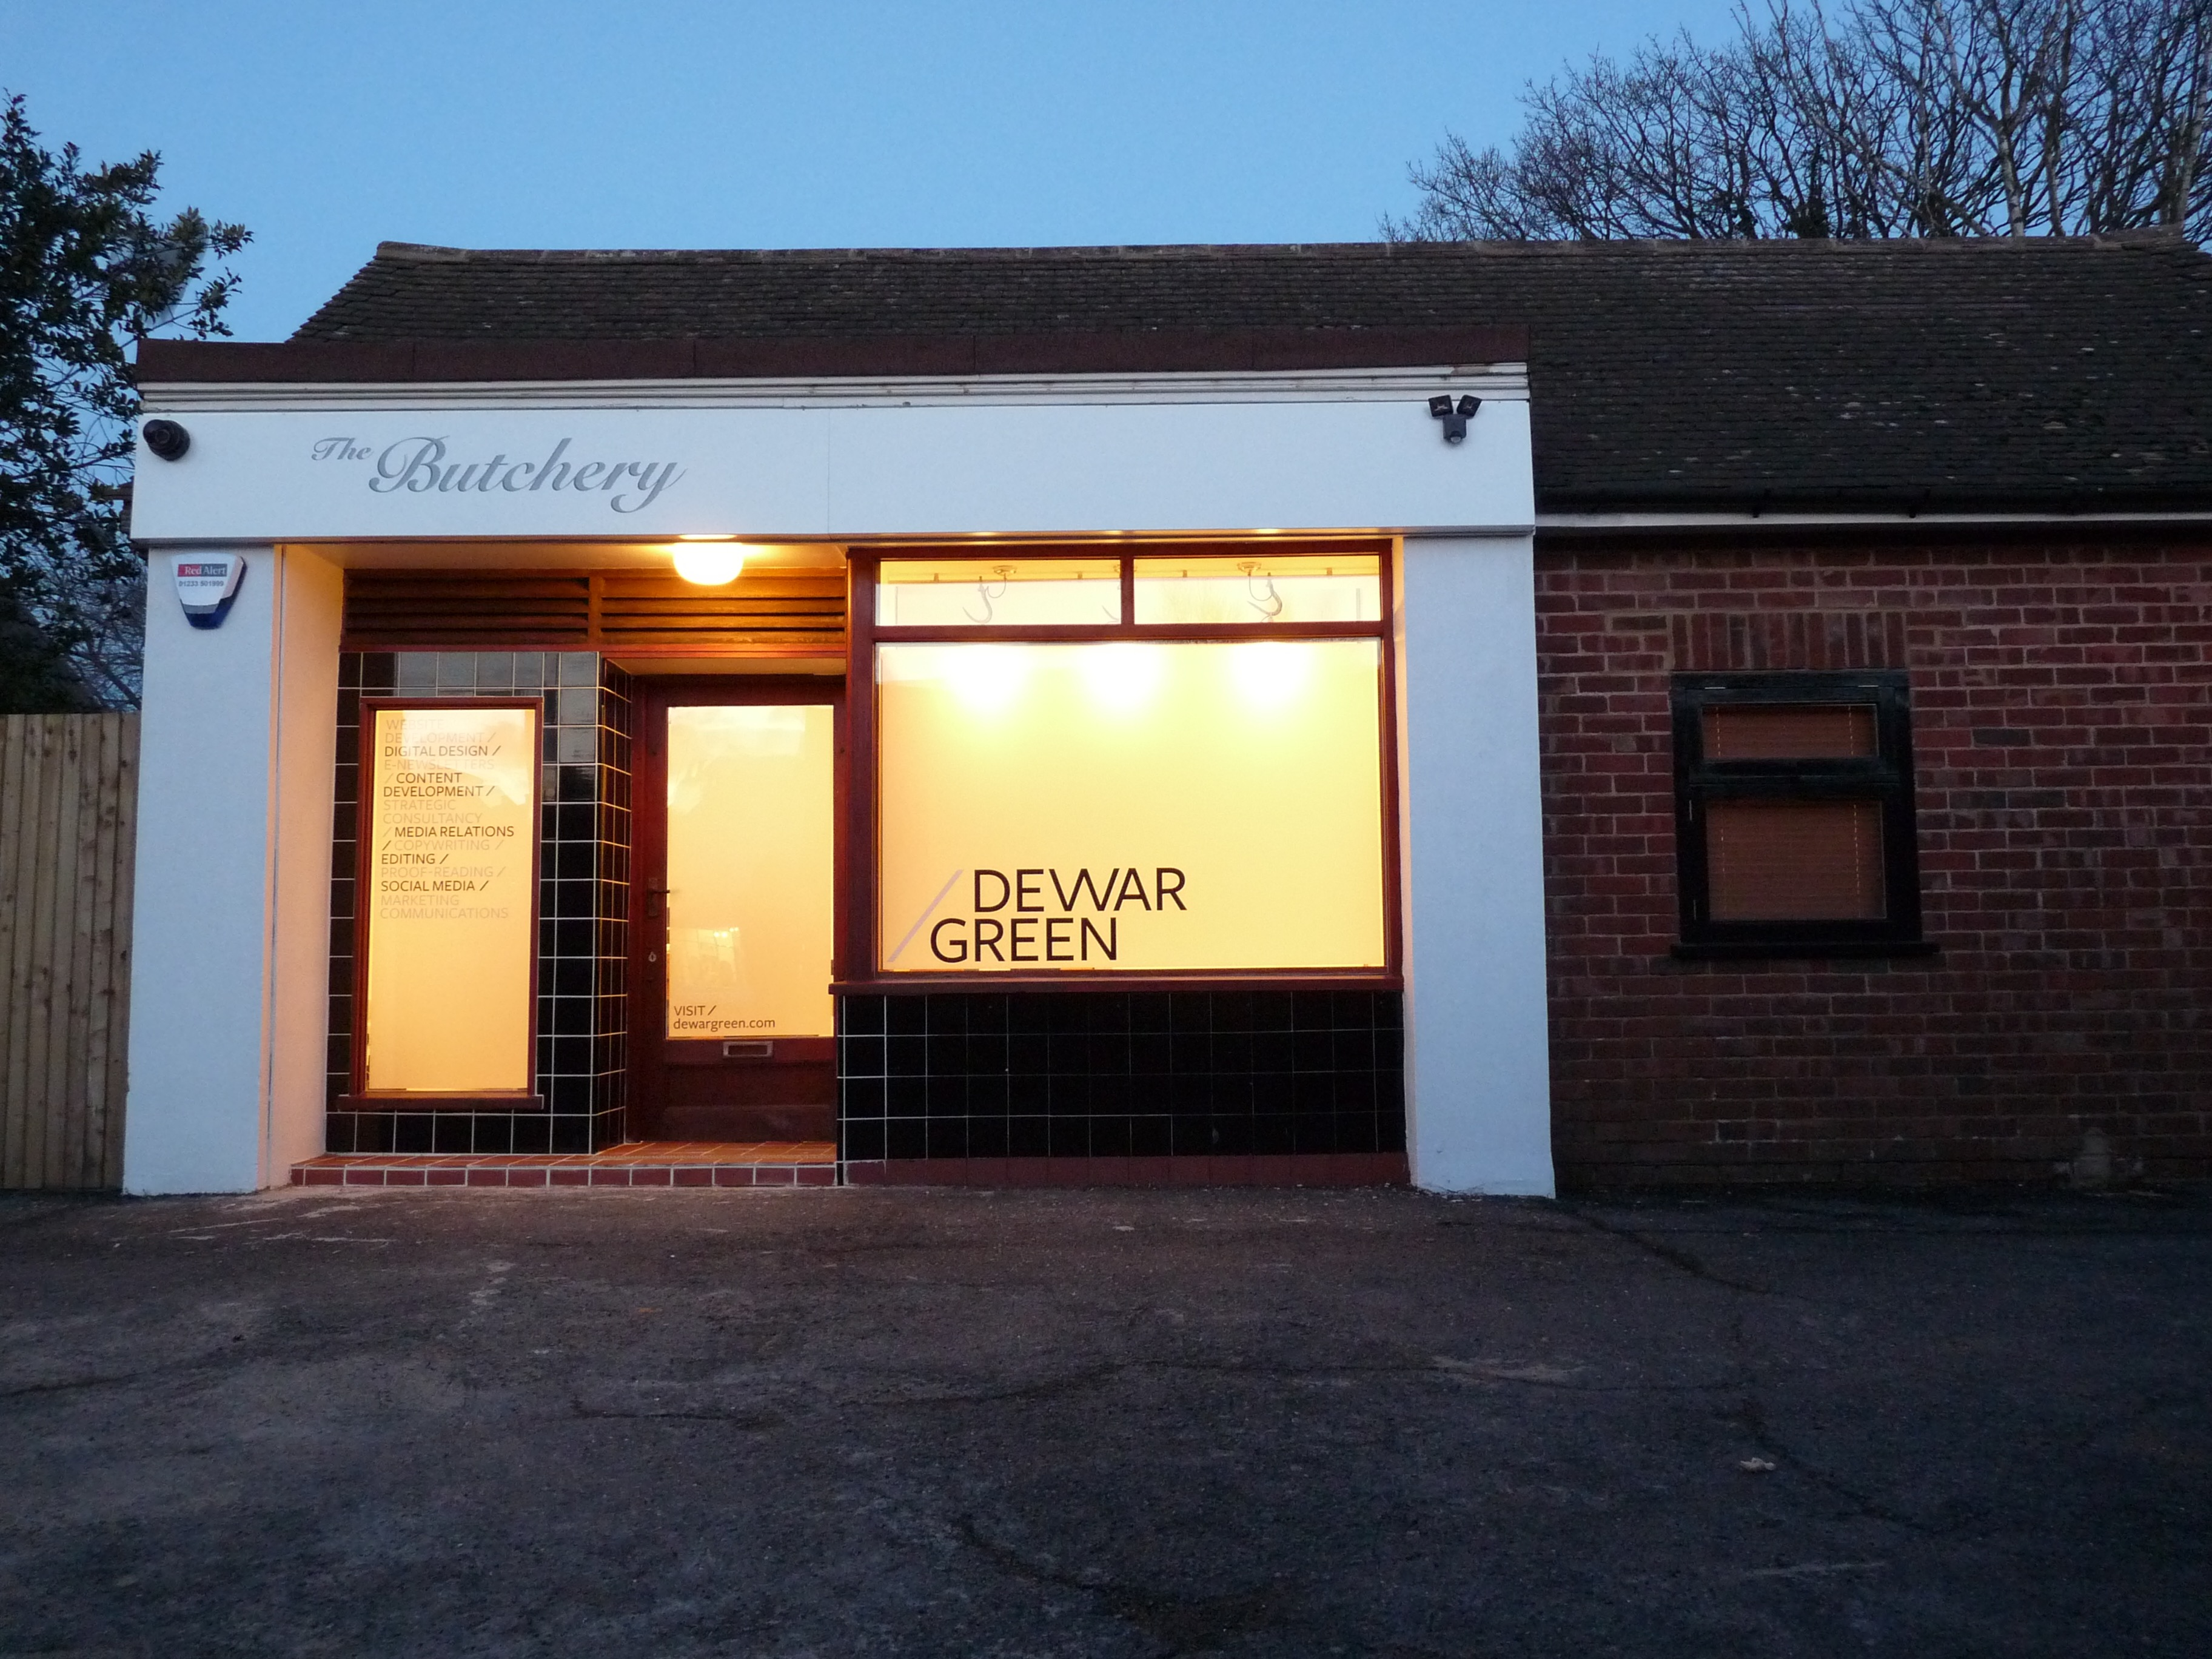 The new Dewar Green HQ at The Butchery